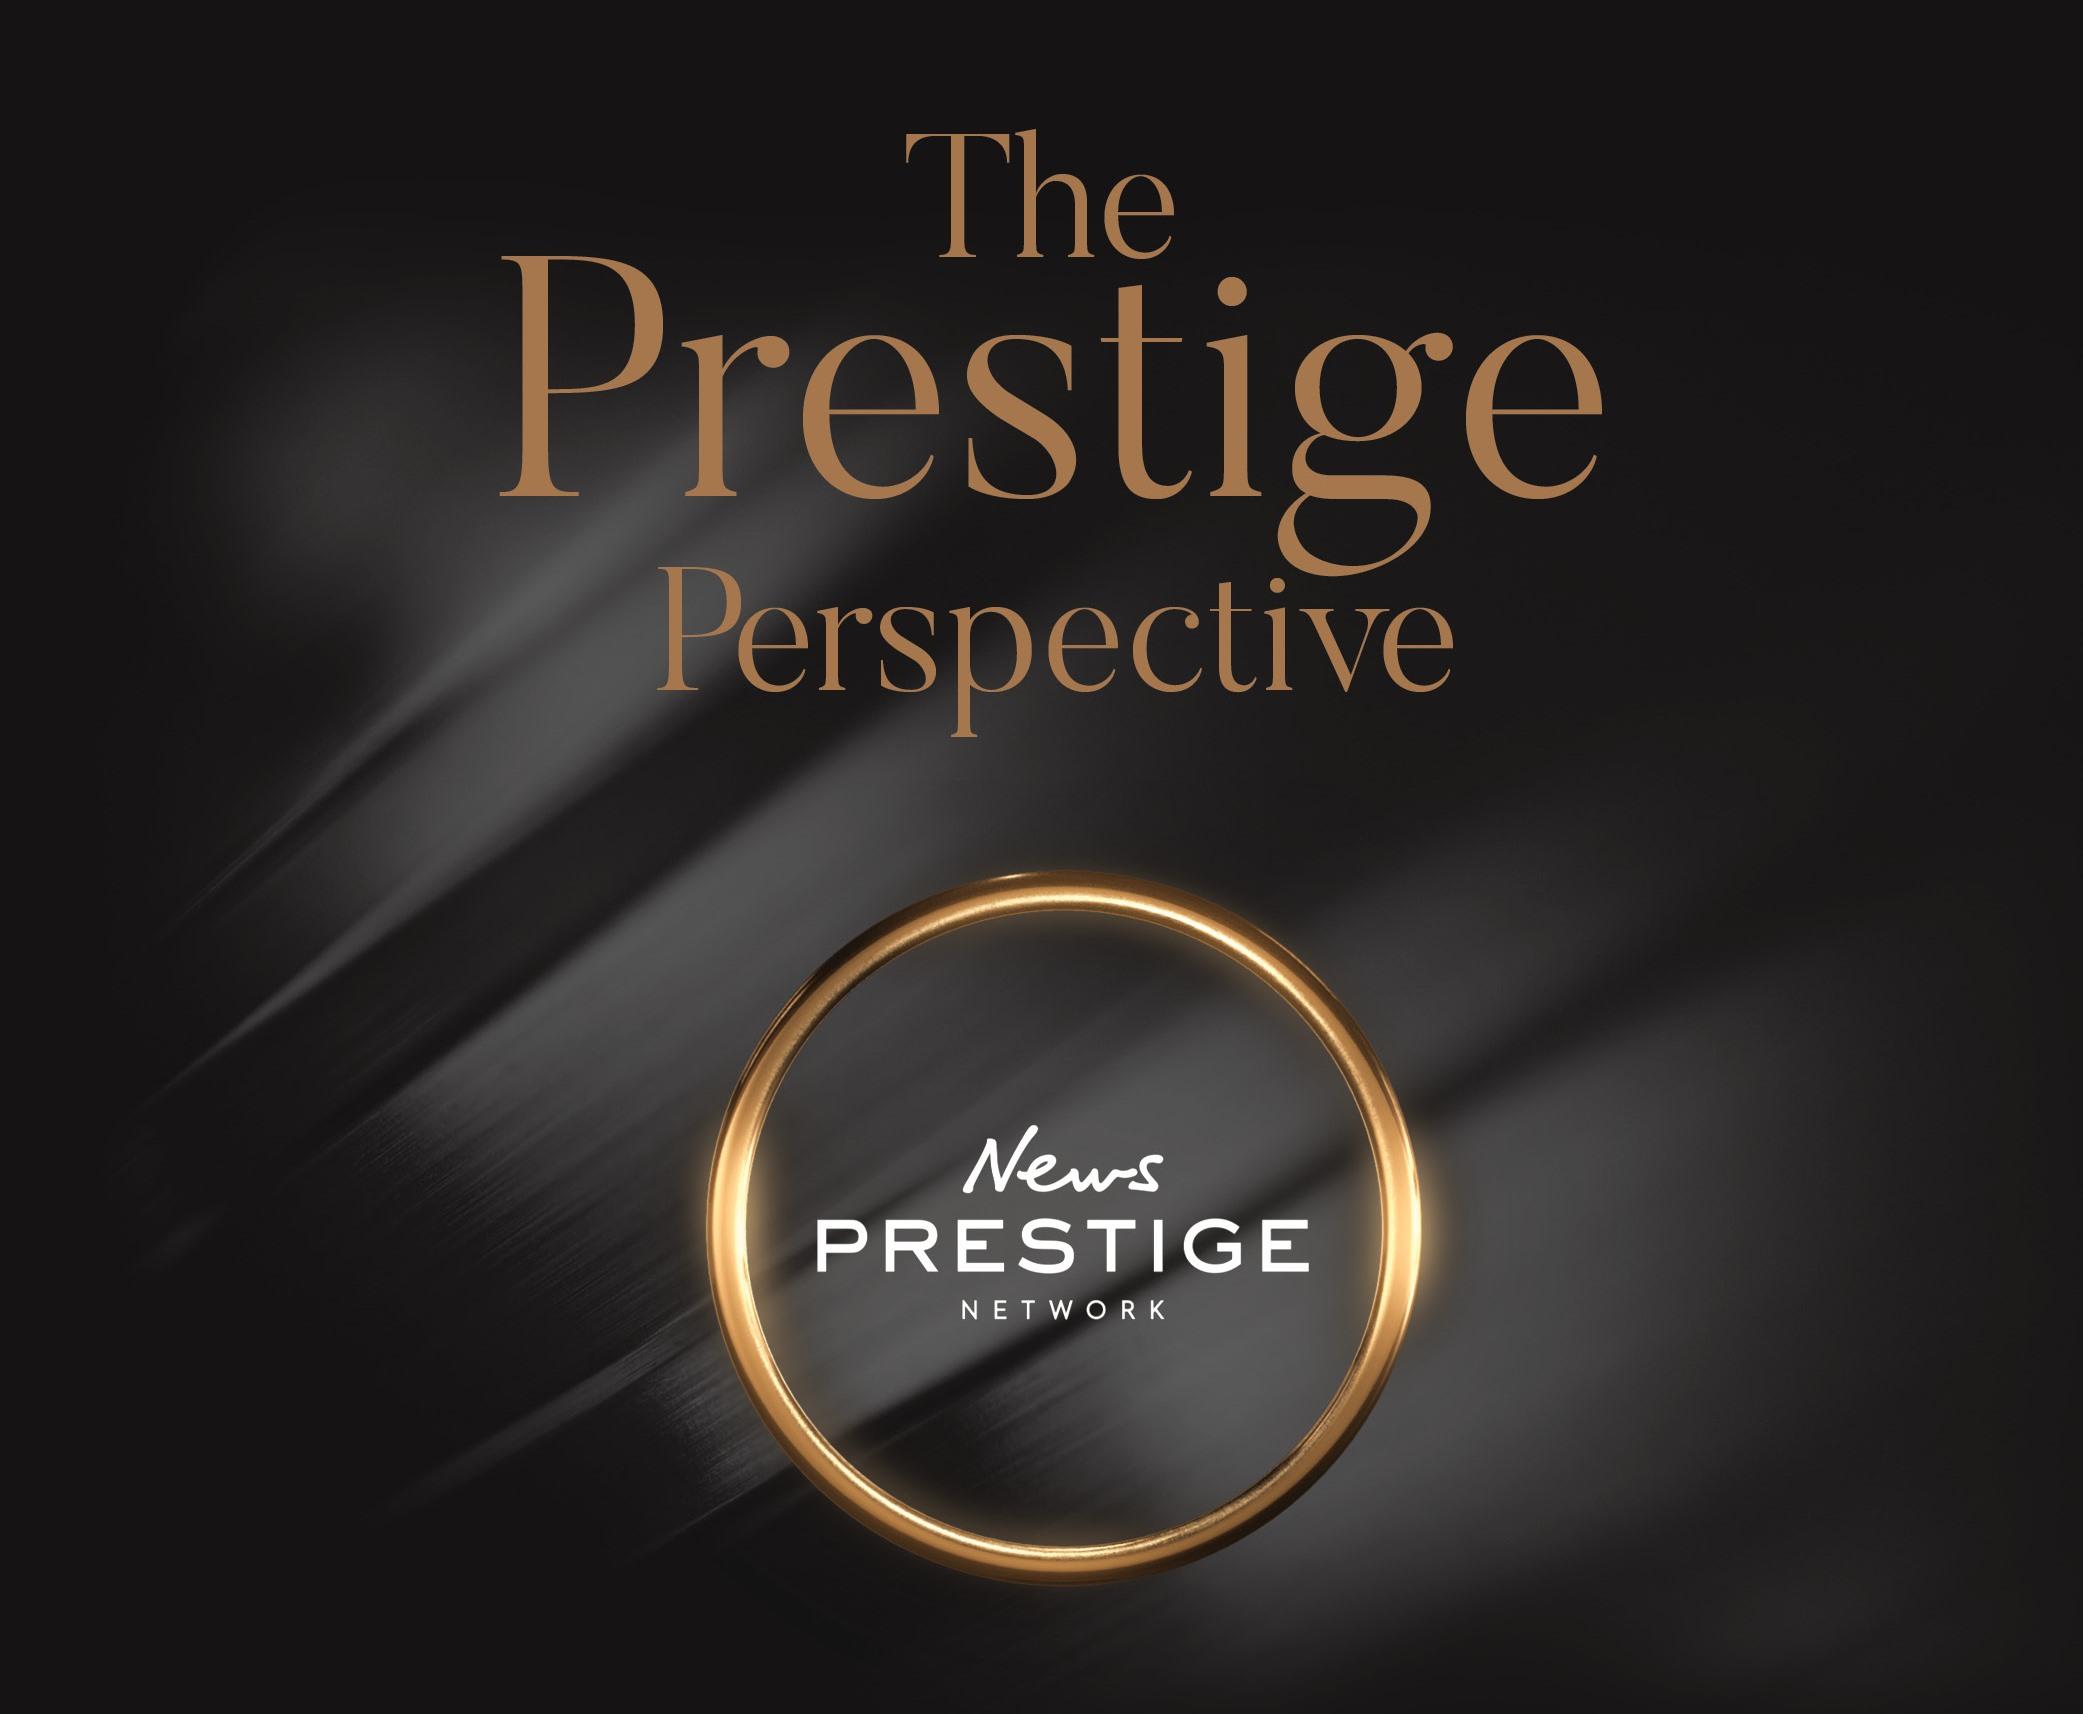 News Prestige Network_The Prestige Perspective